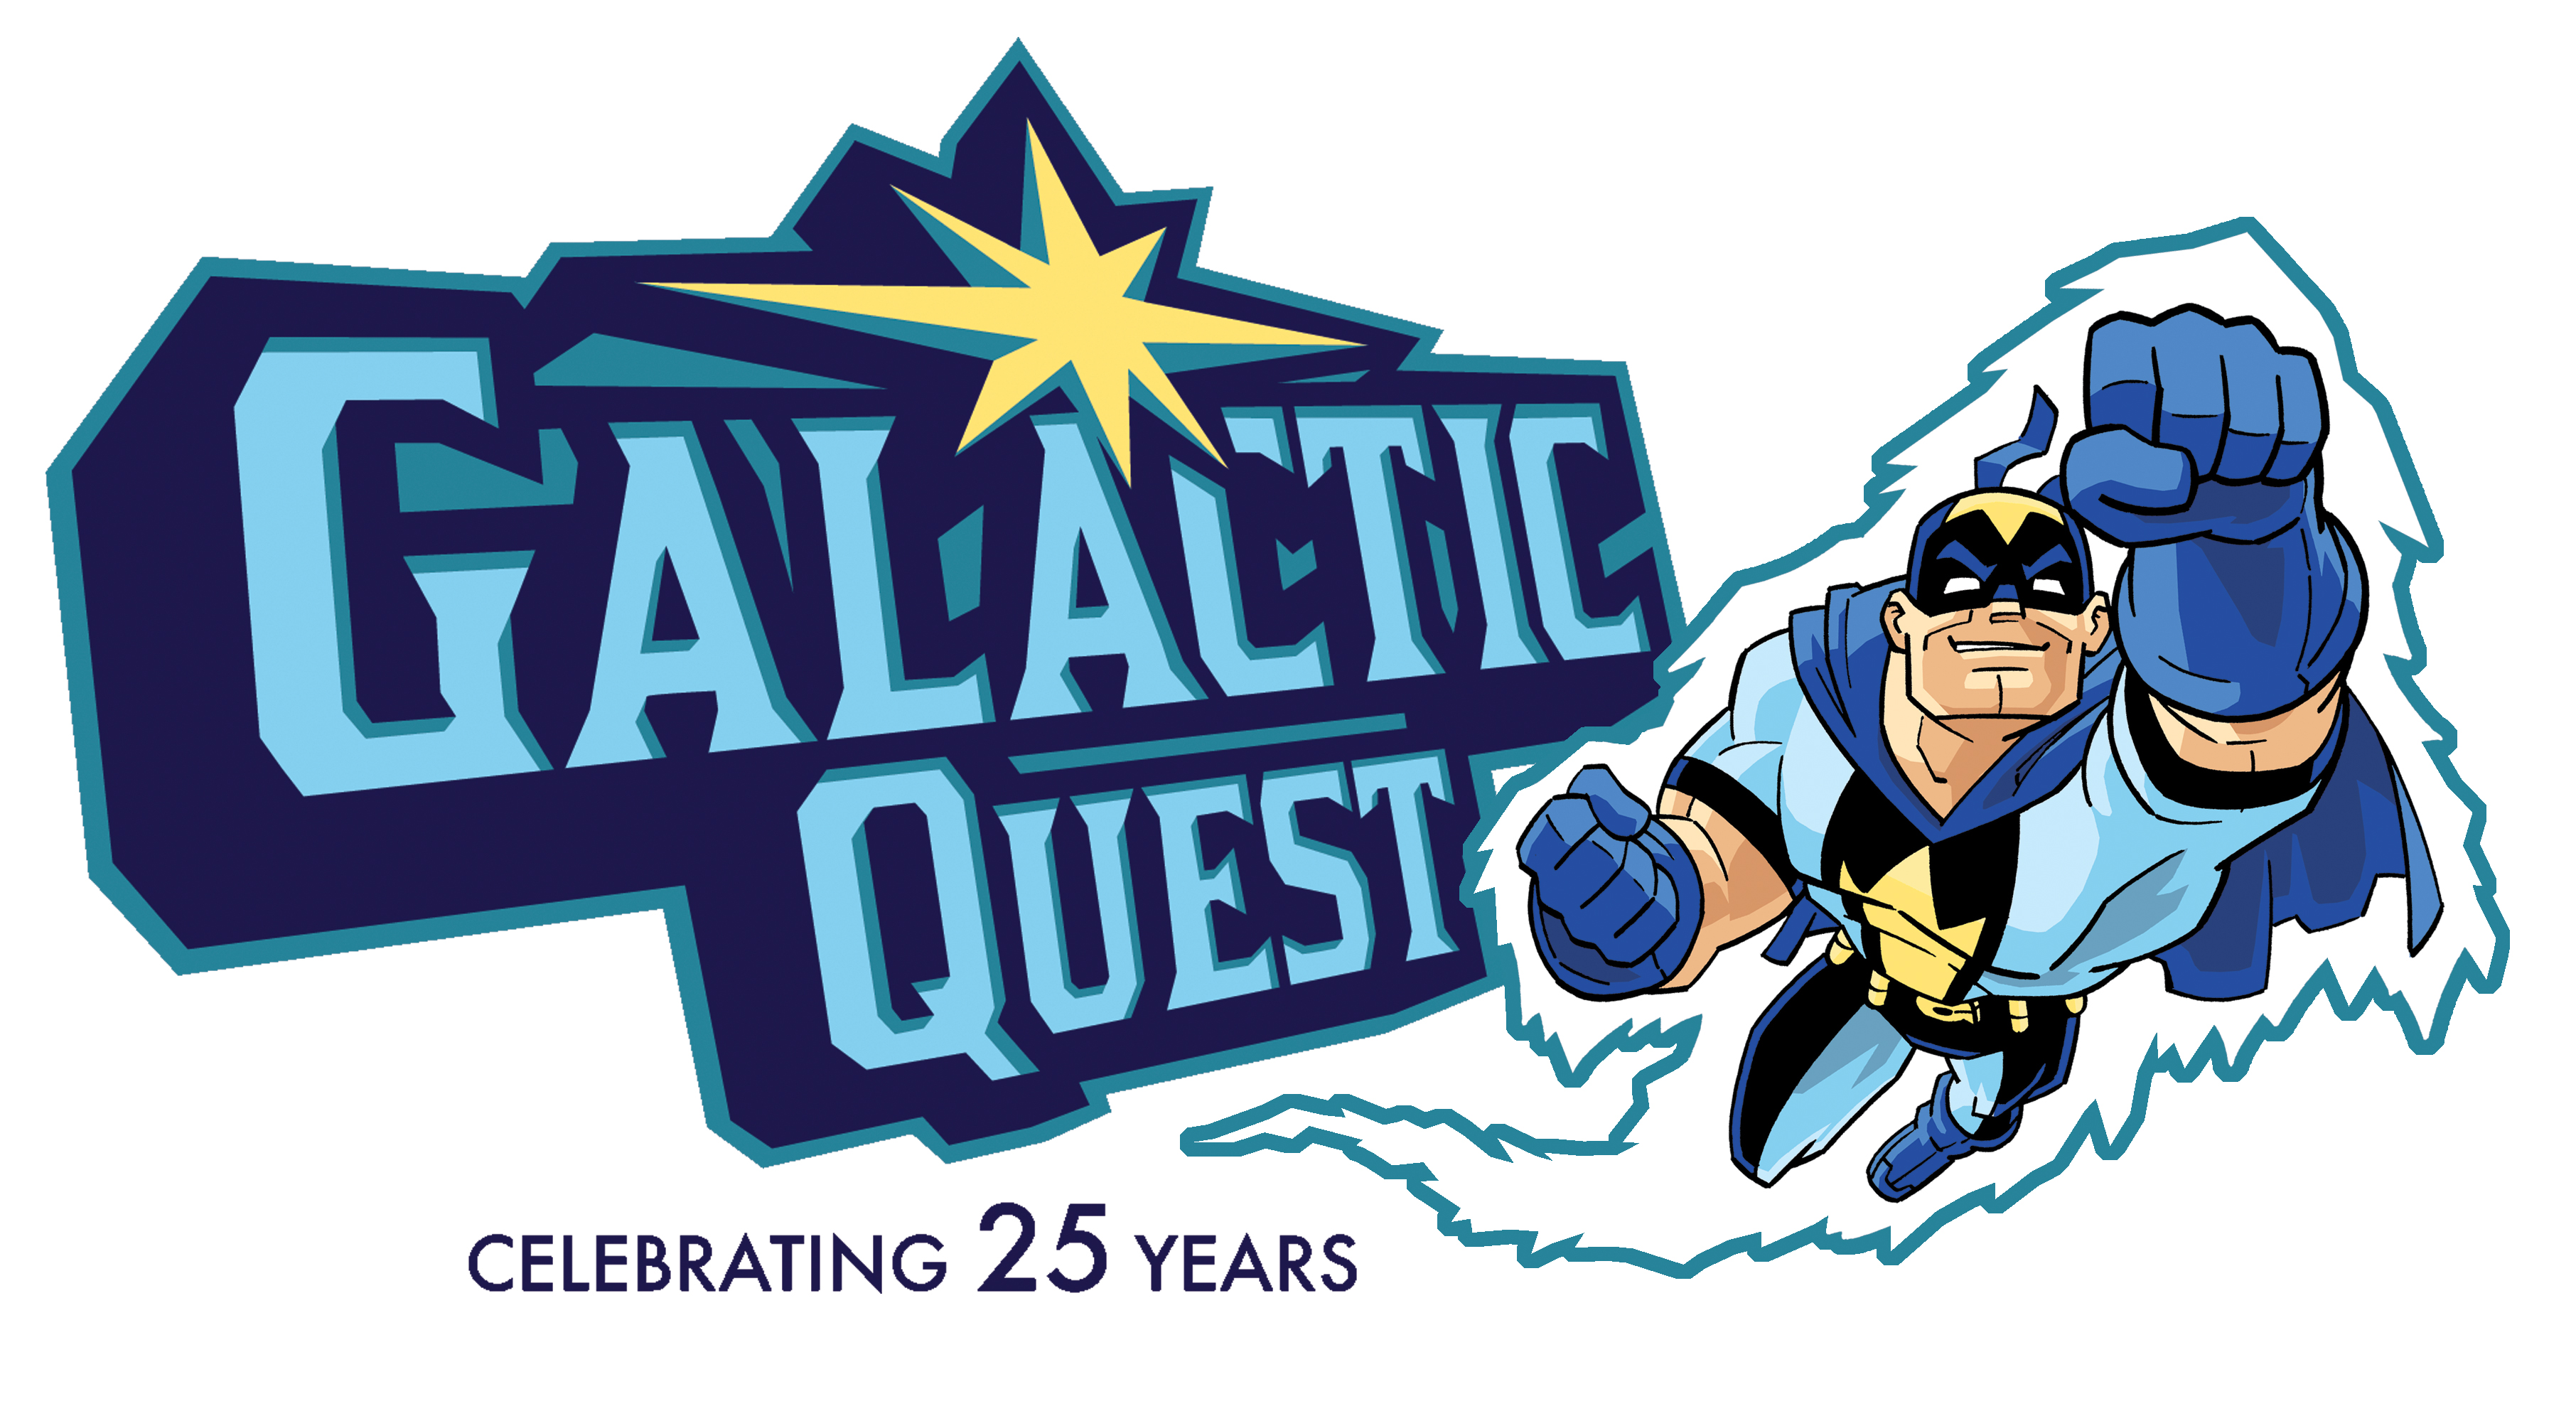 Galactic Quest Logo